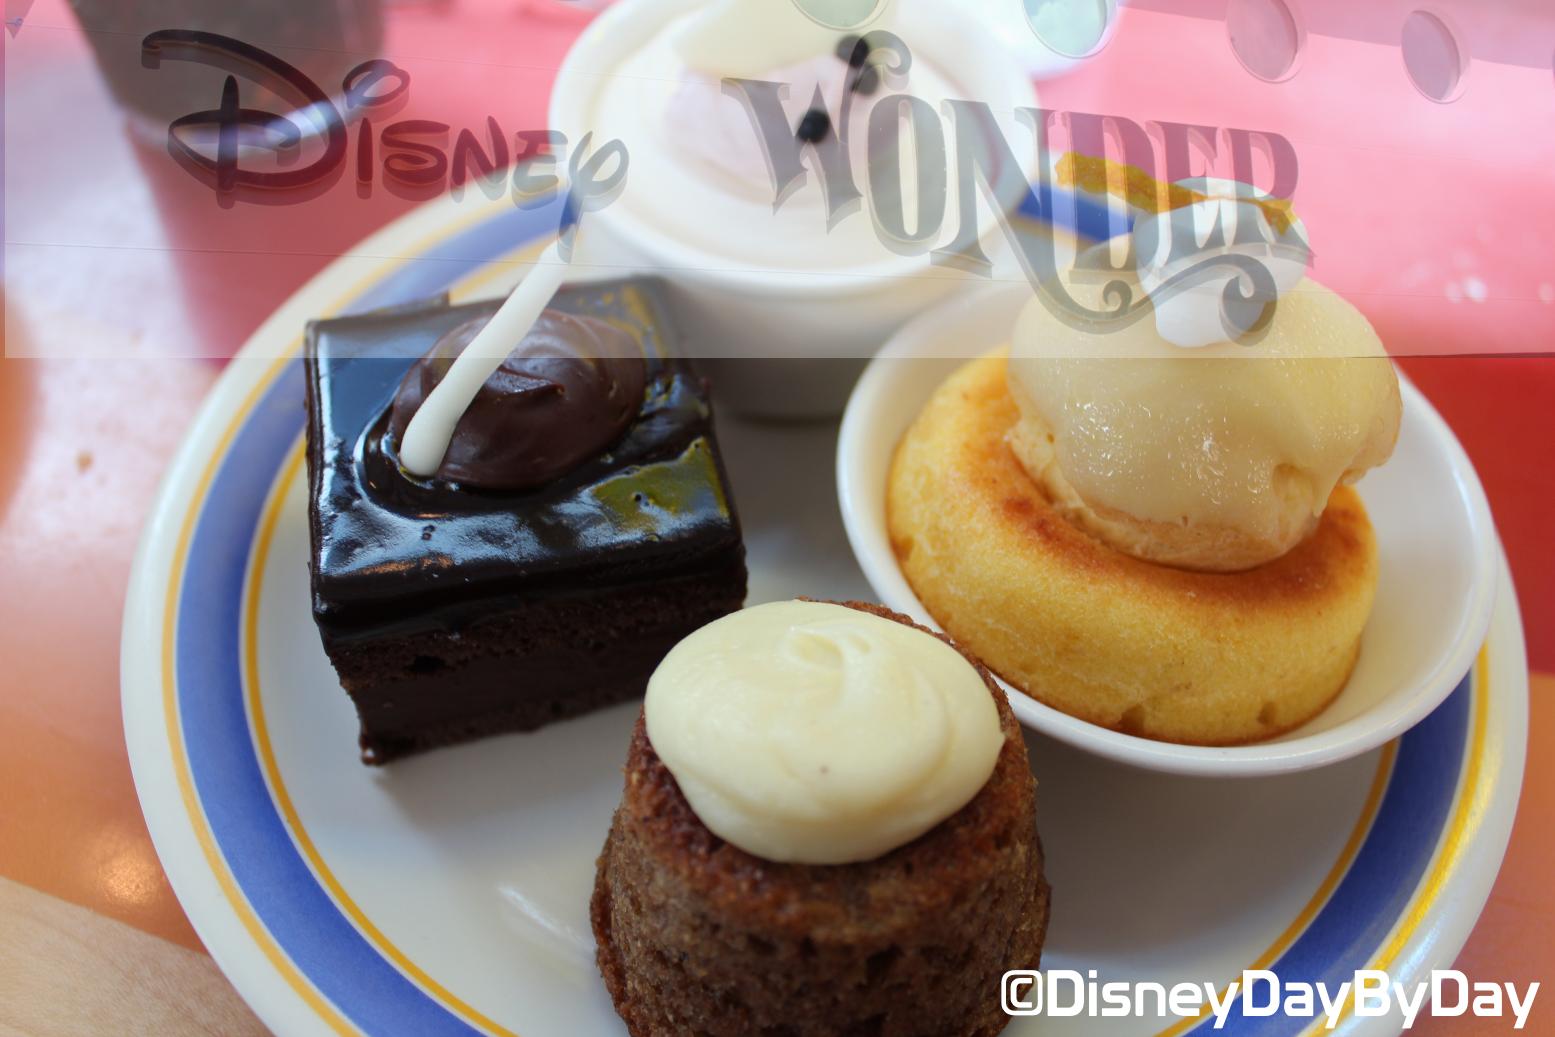 Favorite Food Friday: Disney Wonder Desserts